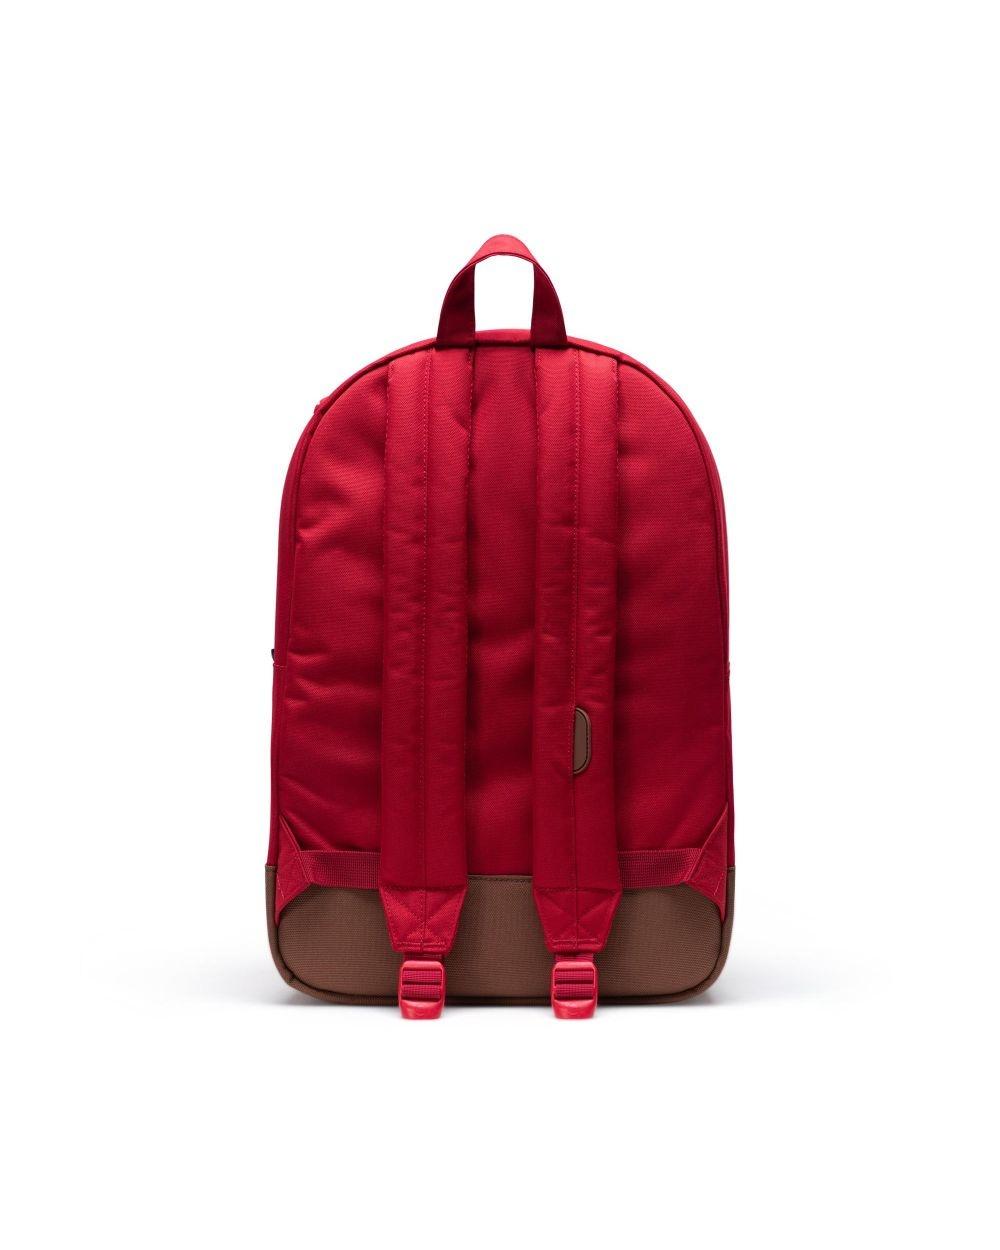 Heritage Red/Saddle brown-4